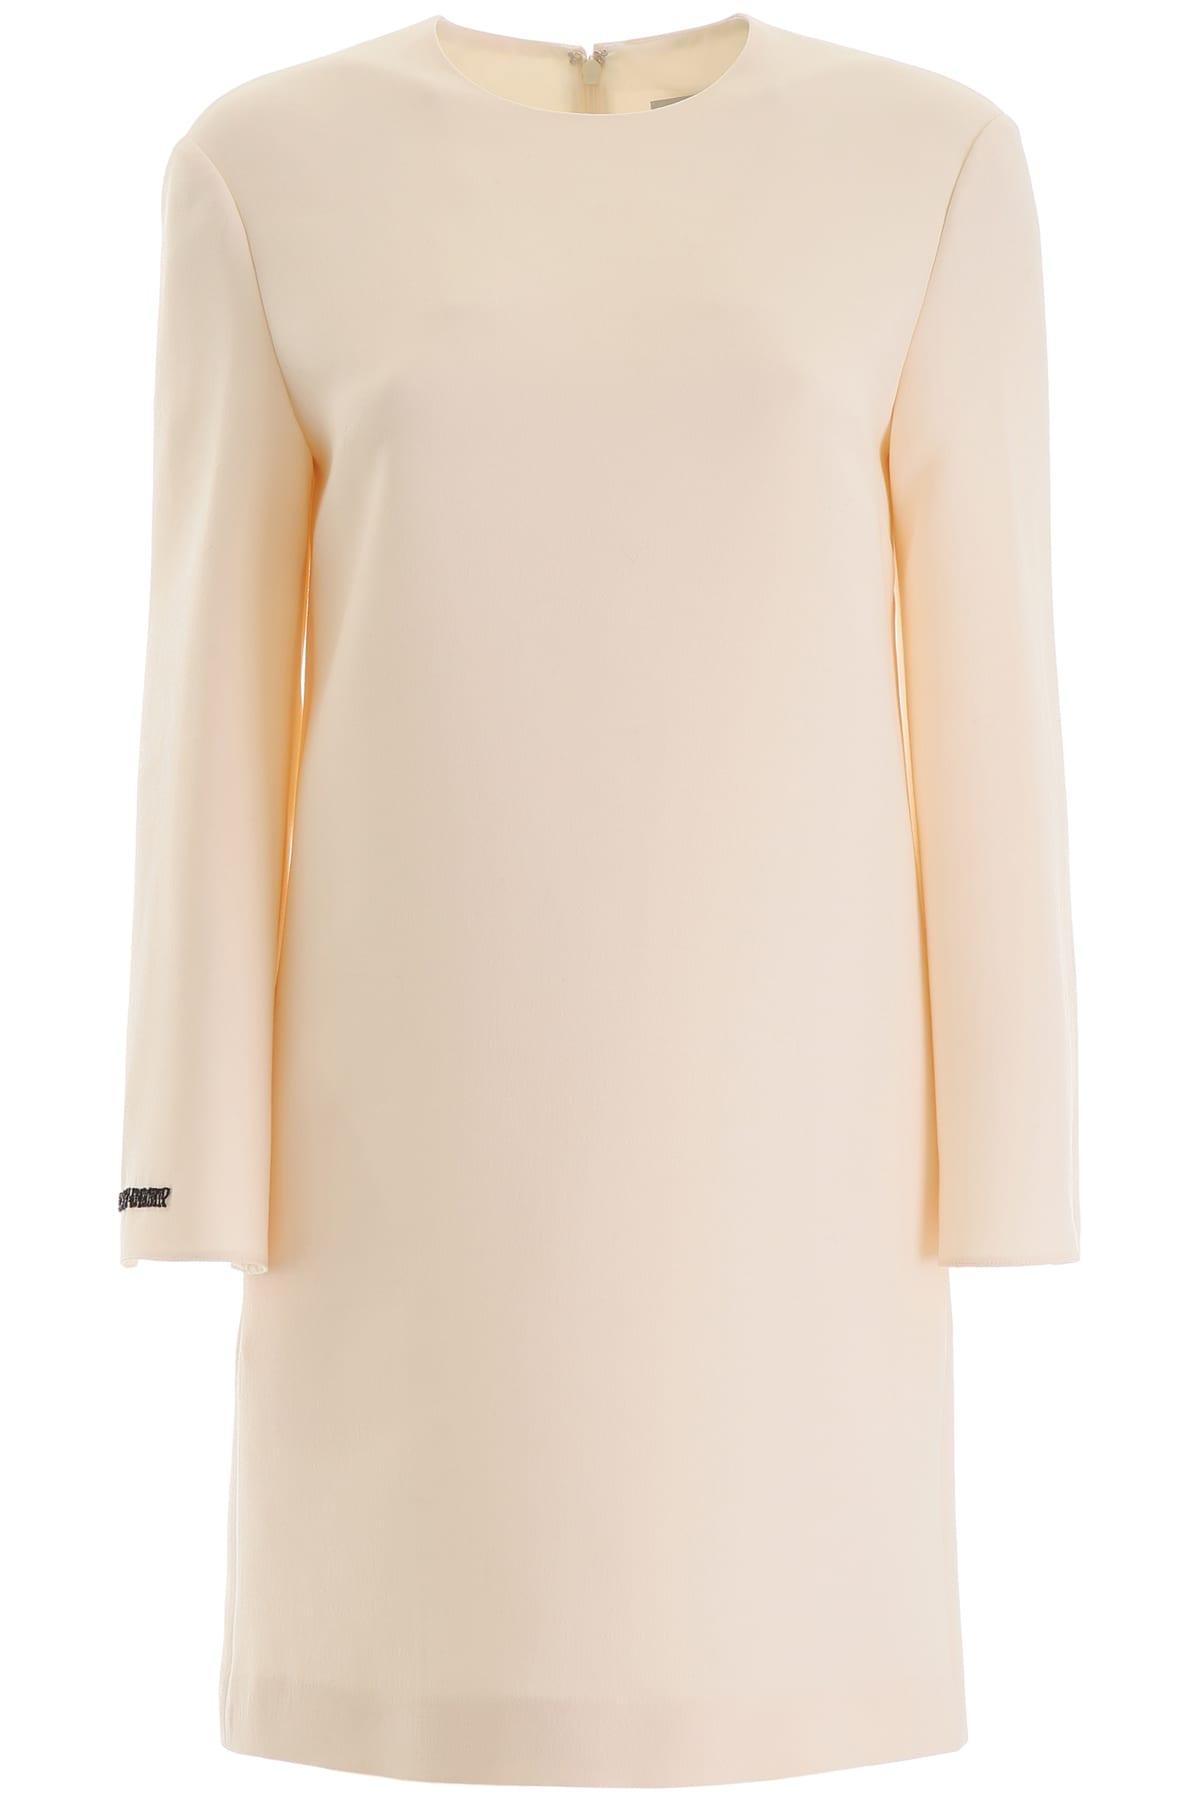 Valentino Poetry Embroidery Mini Dress